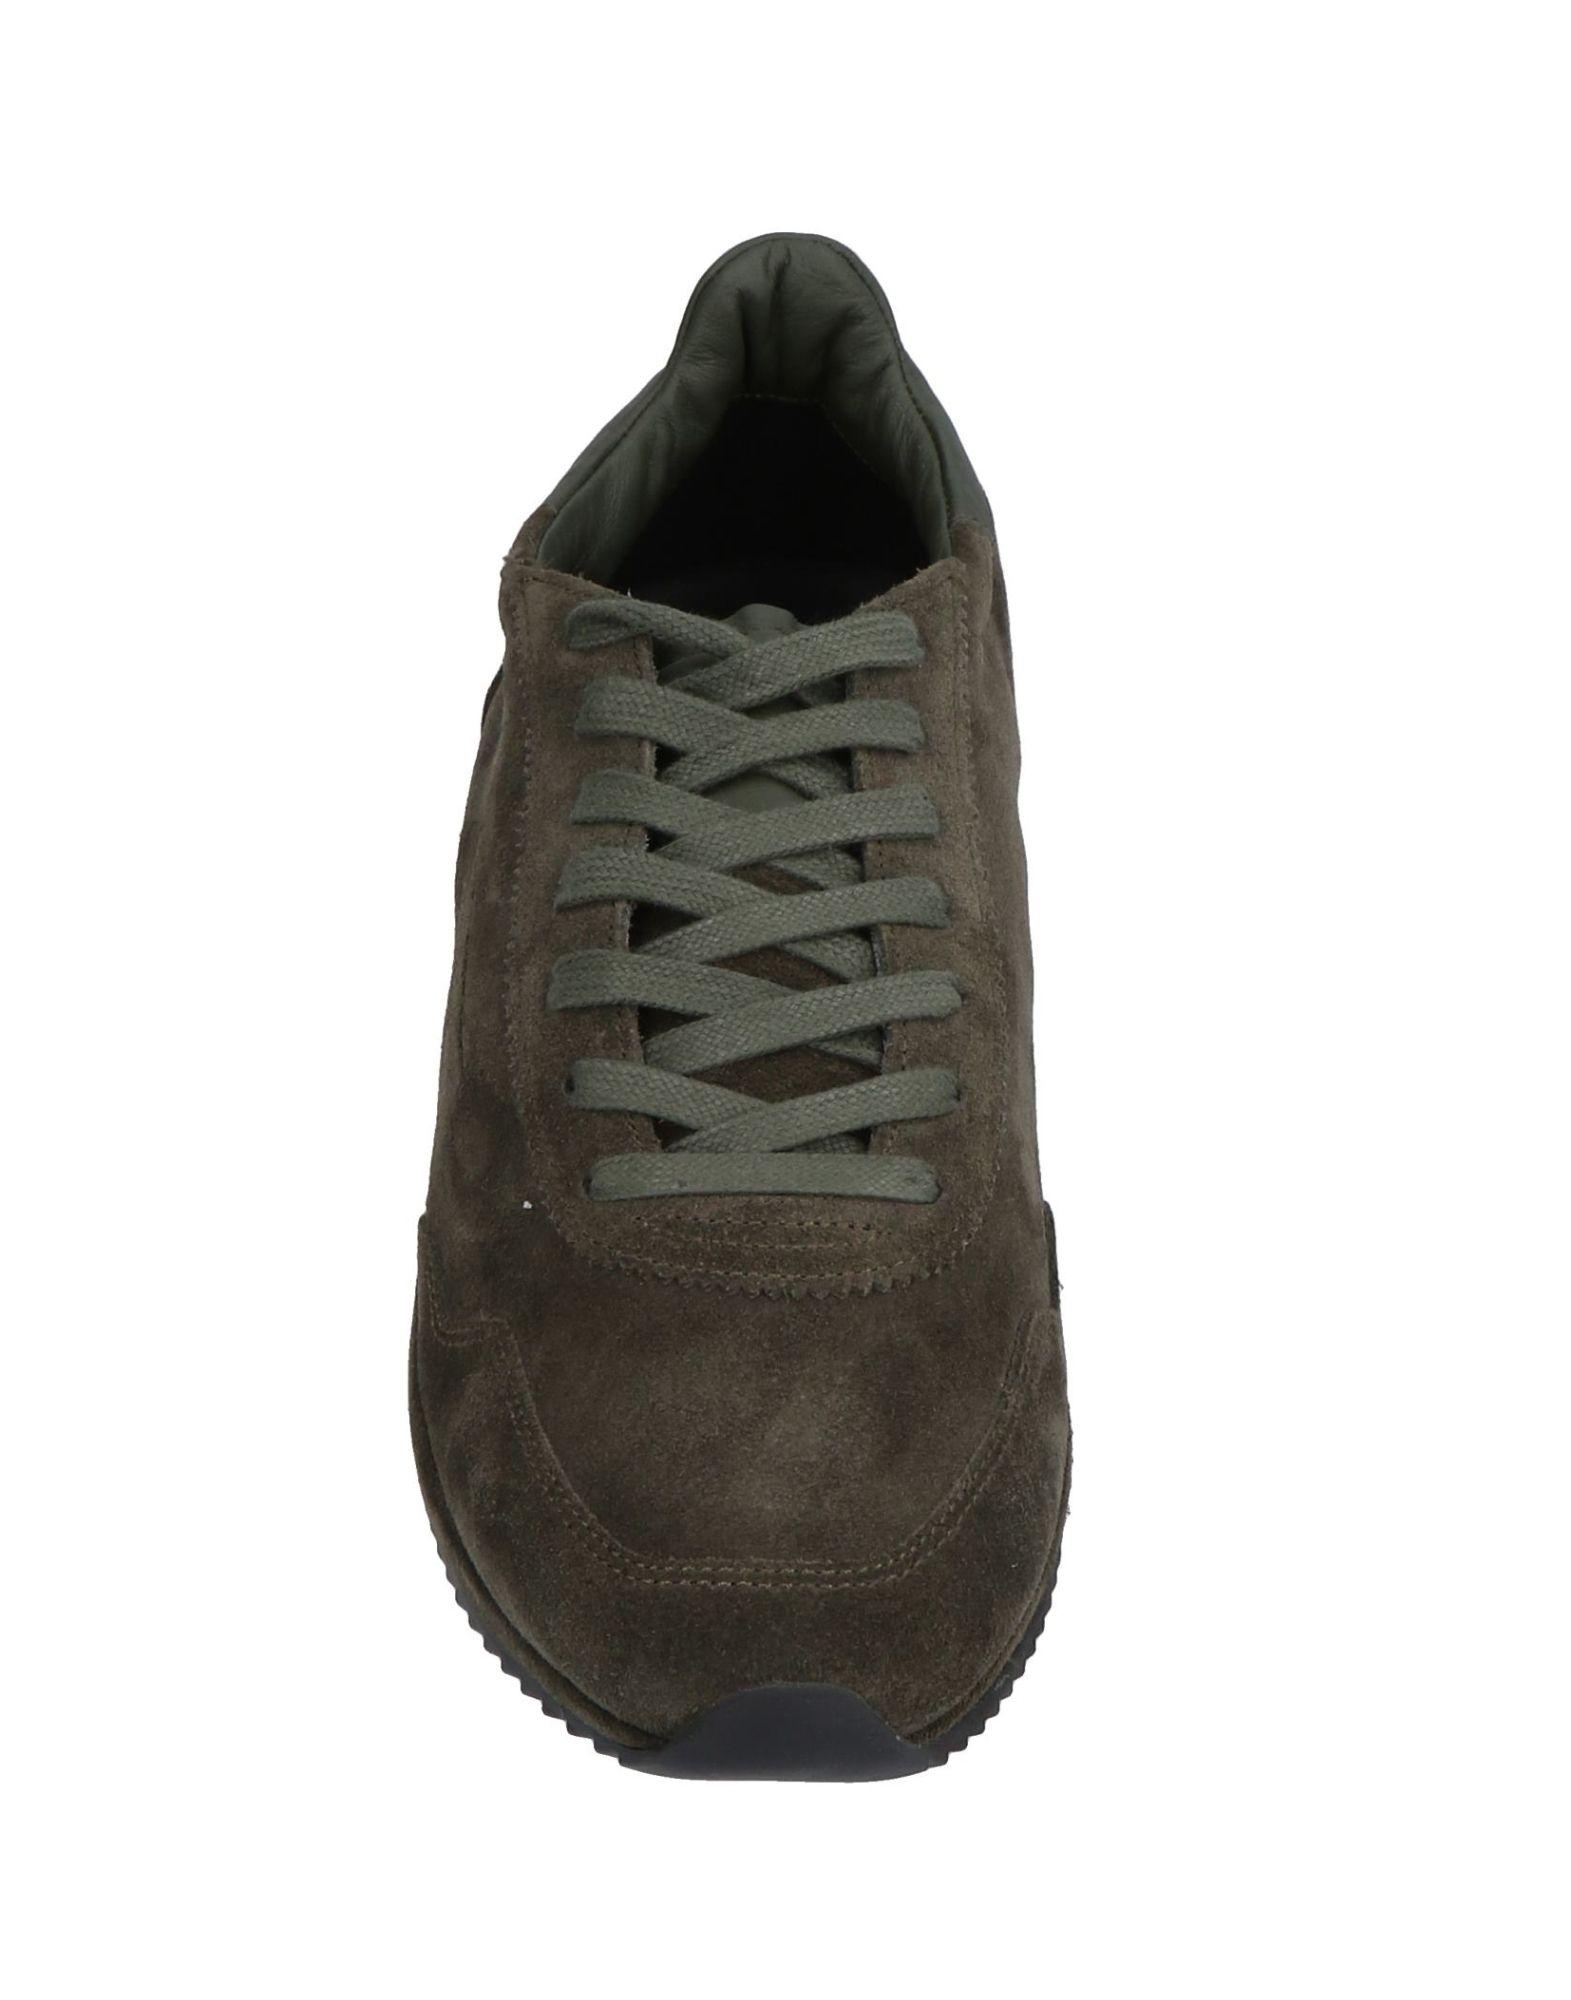 Ghōud 11486826OU Venice Sneakers Herren  11486826OU Ghōud Gute Qualität beliebte Schuhe 3890ef